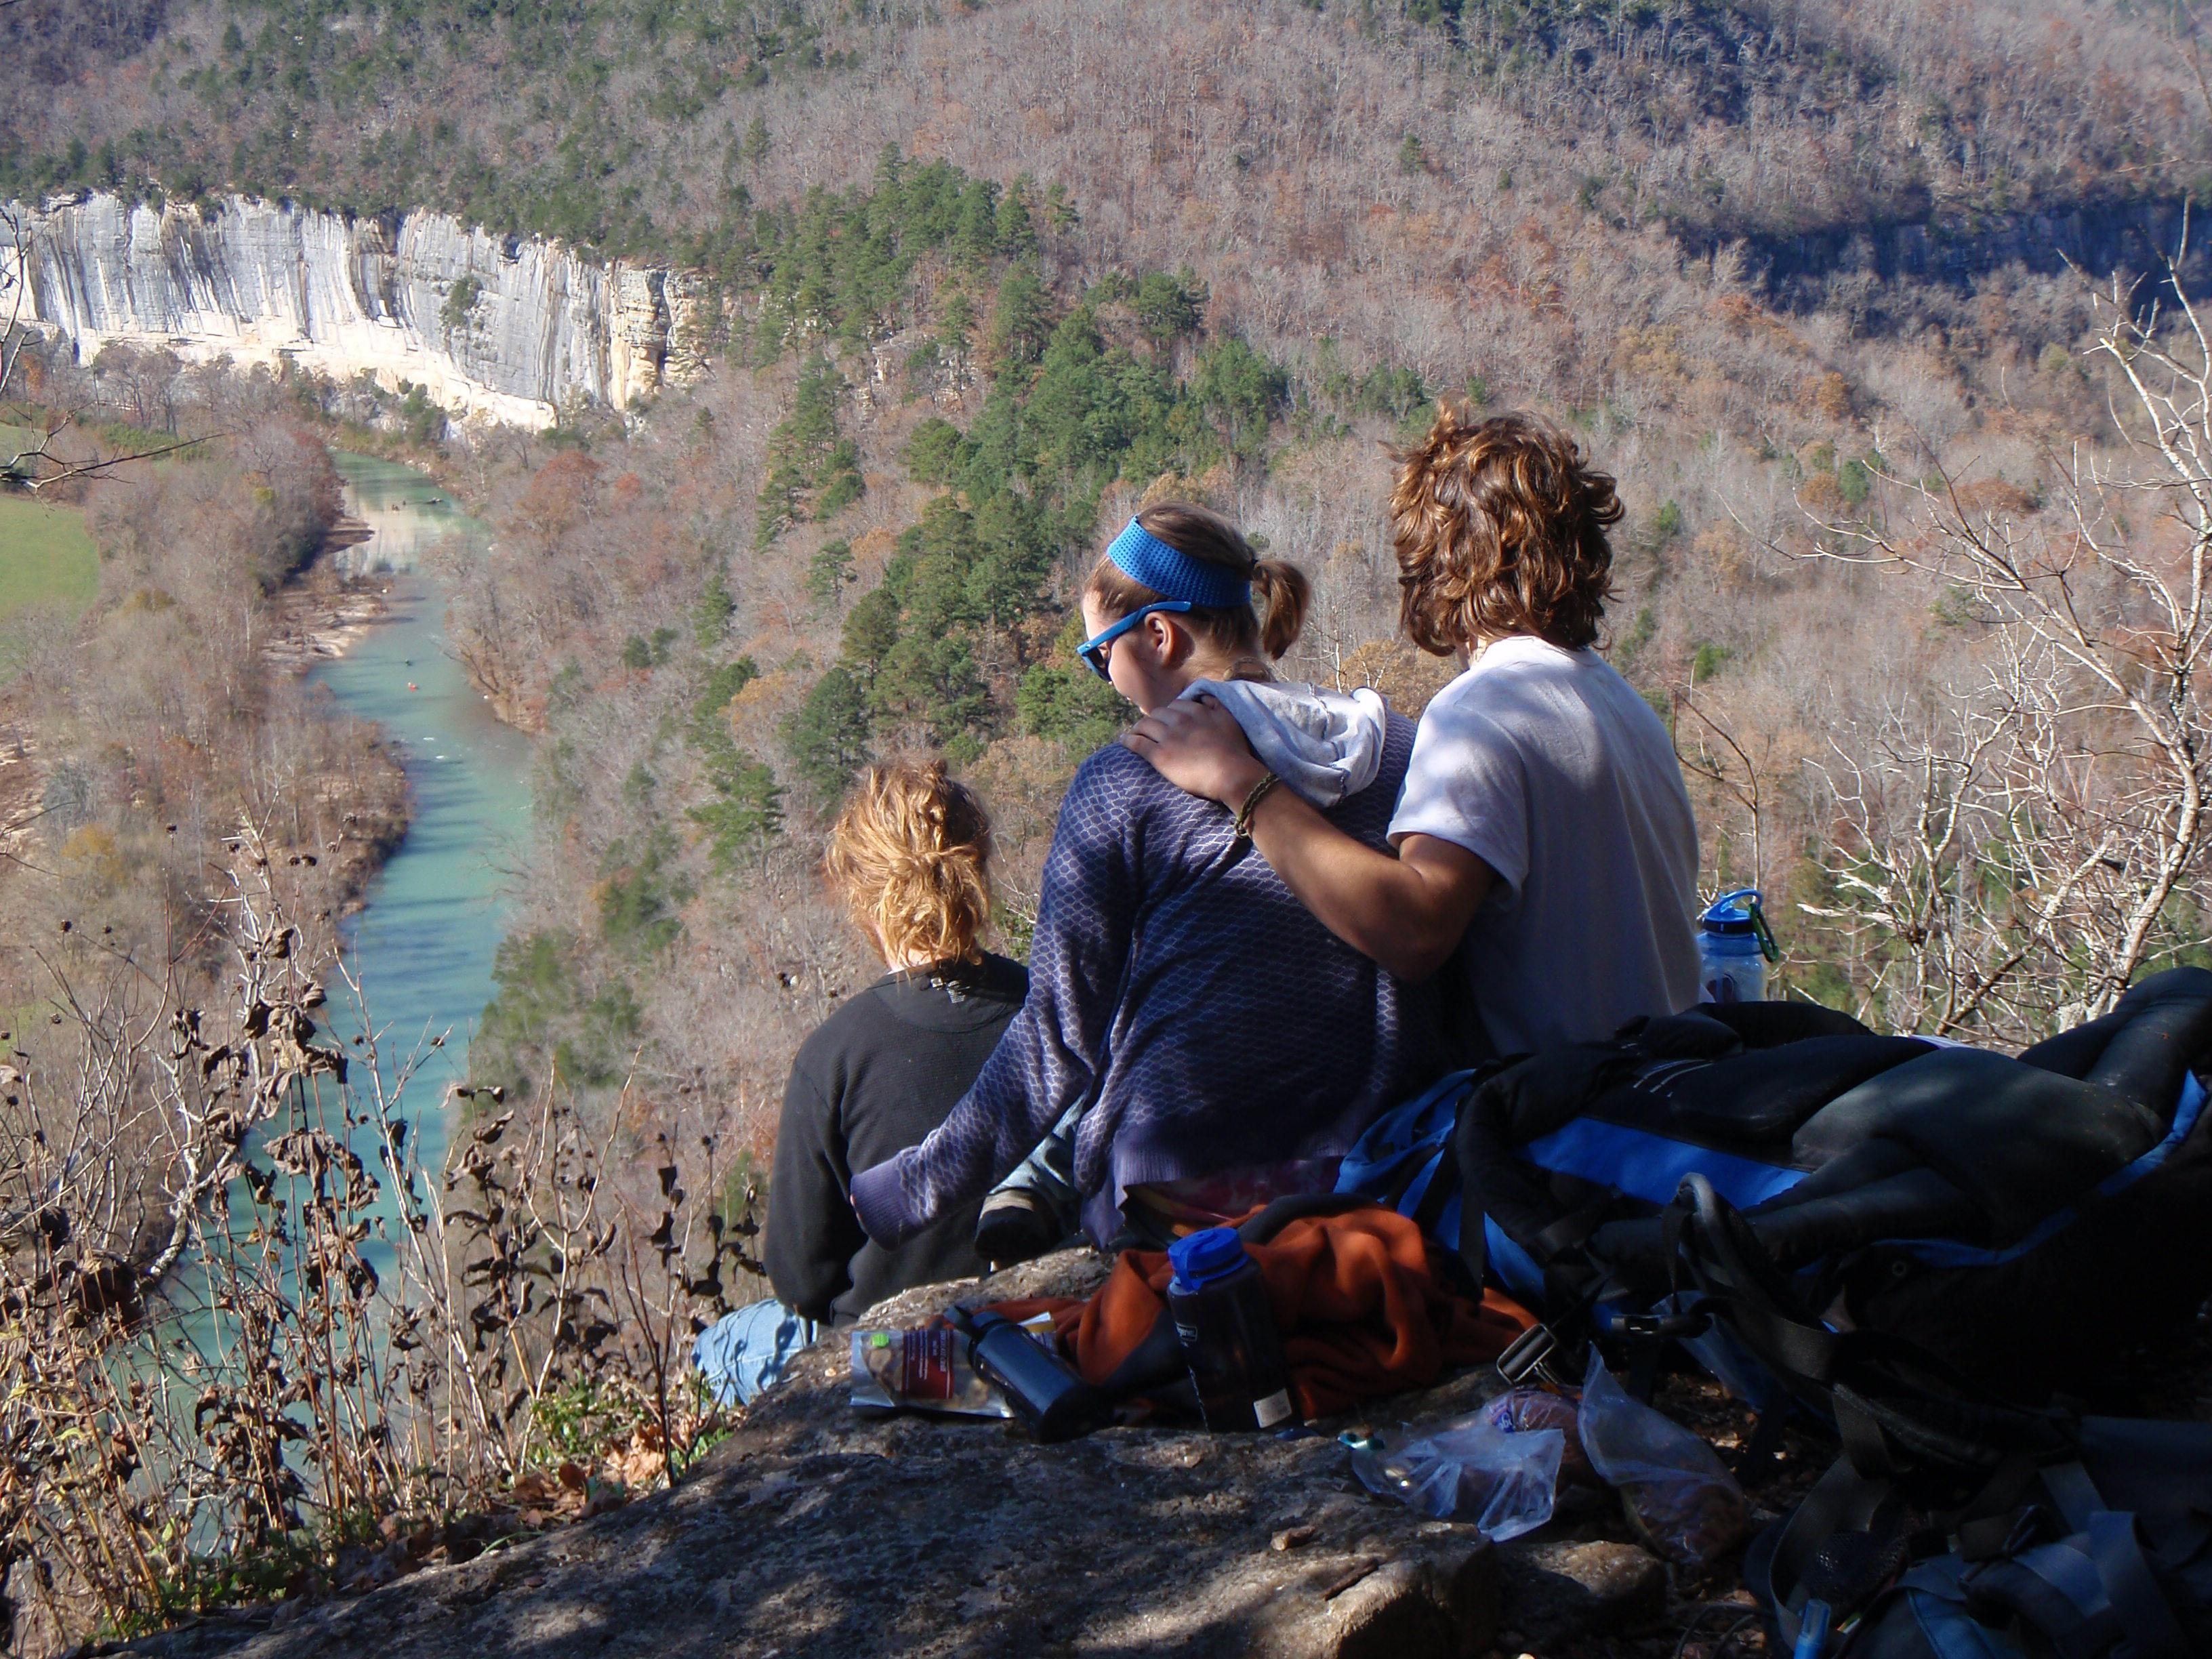 Ecotourism and Adventure Travel